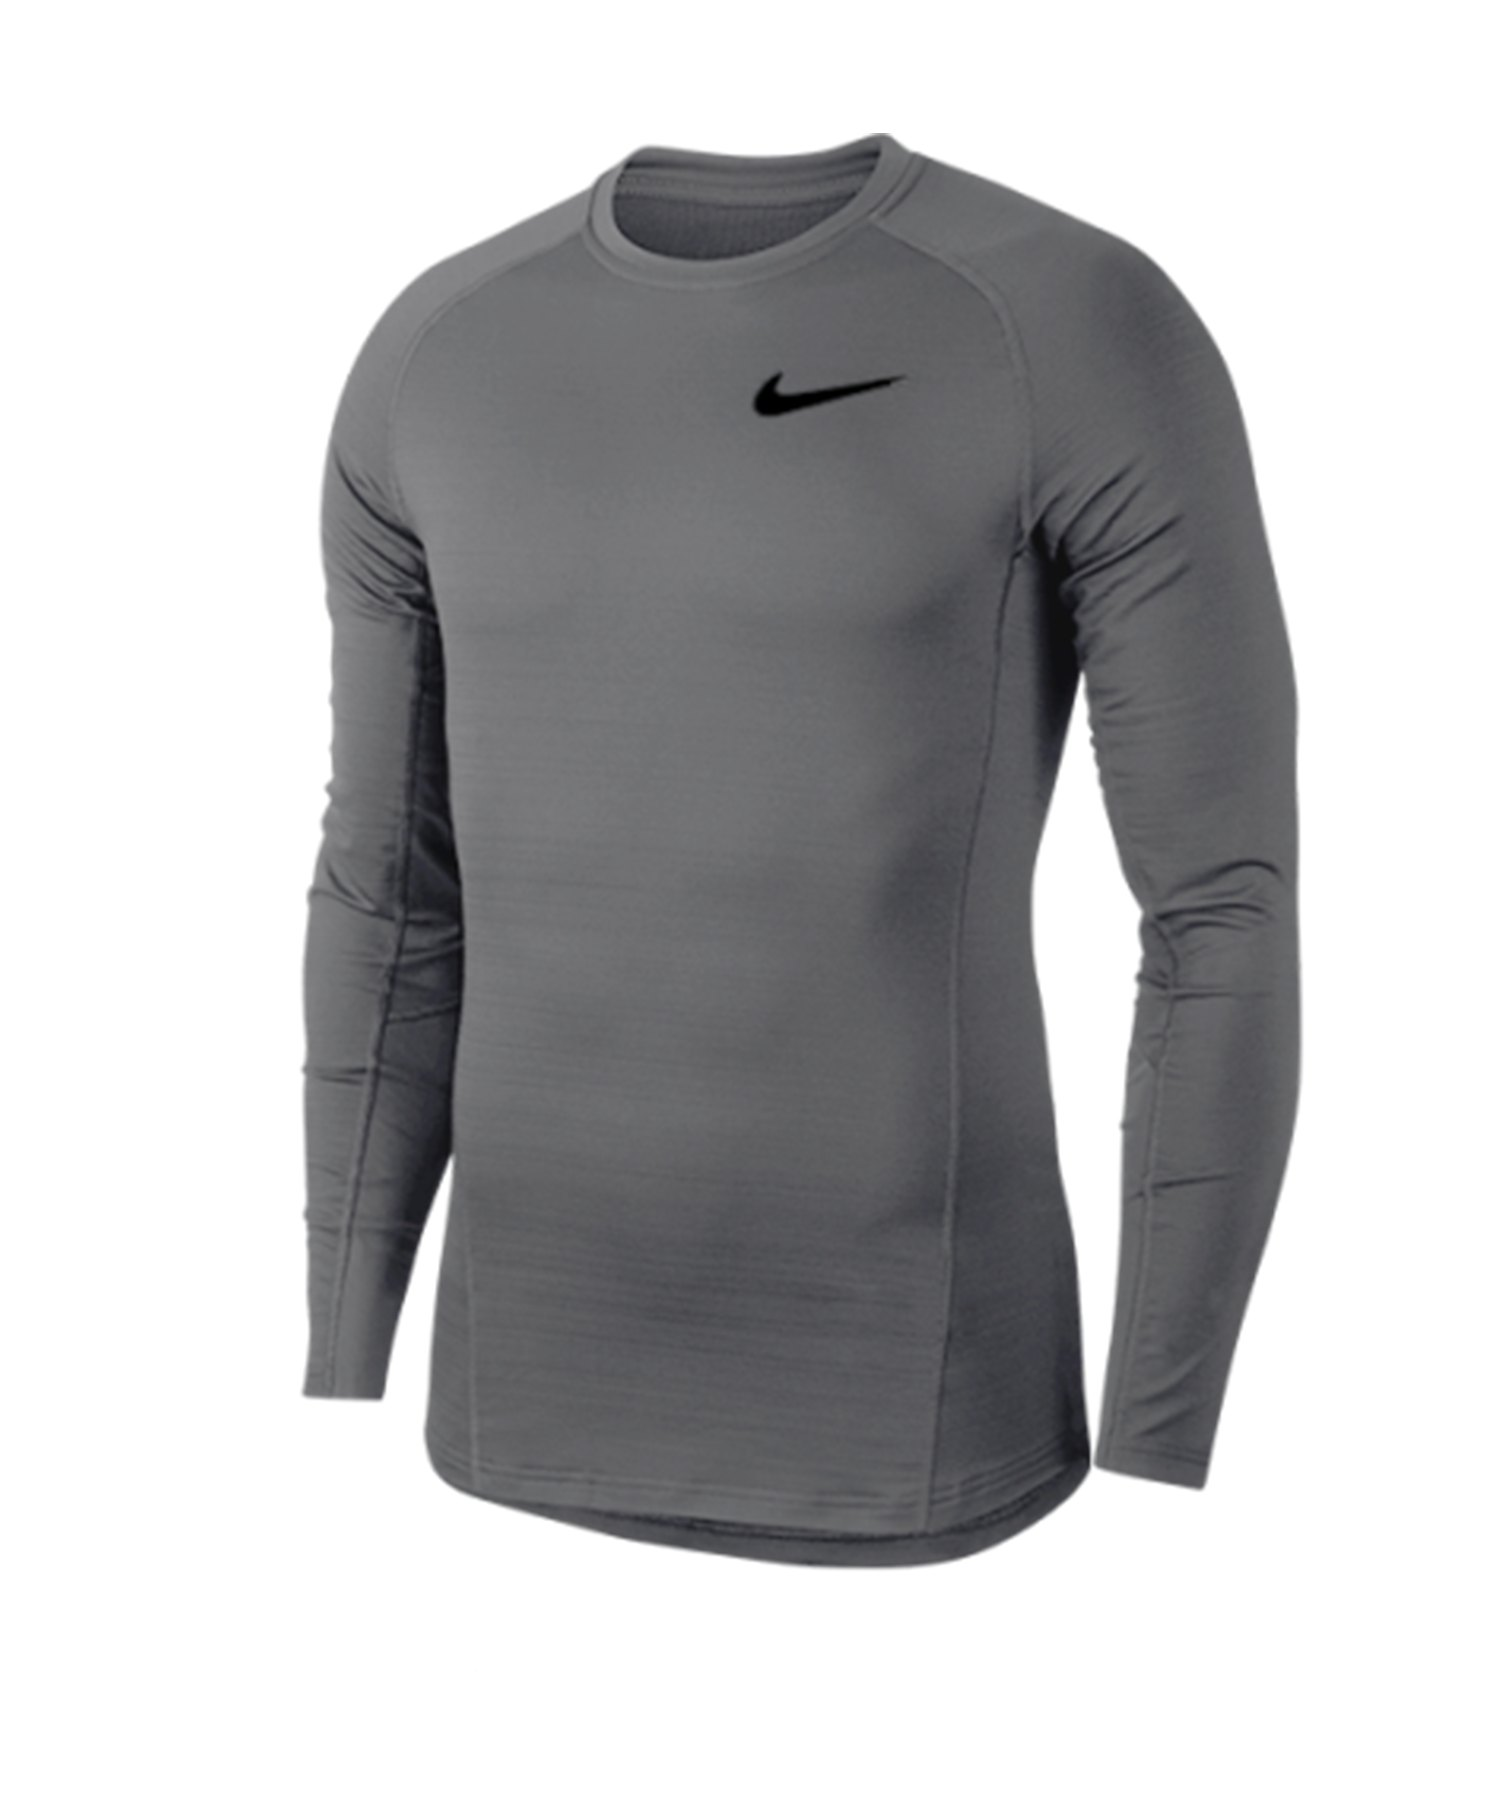 Nike Pro Warm langarm Shirt Grau Schwarz F036 - grau